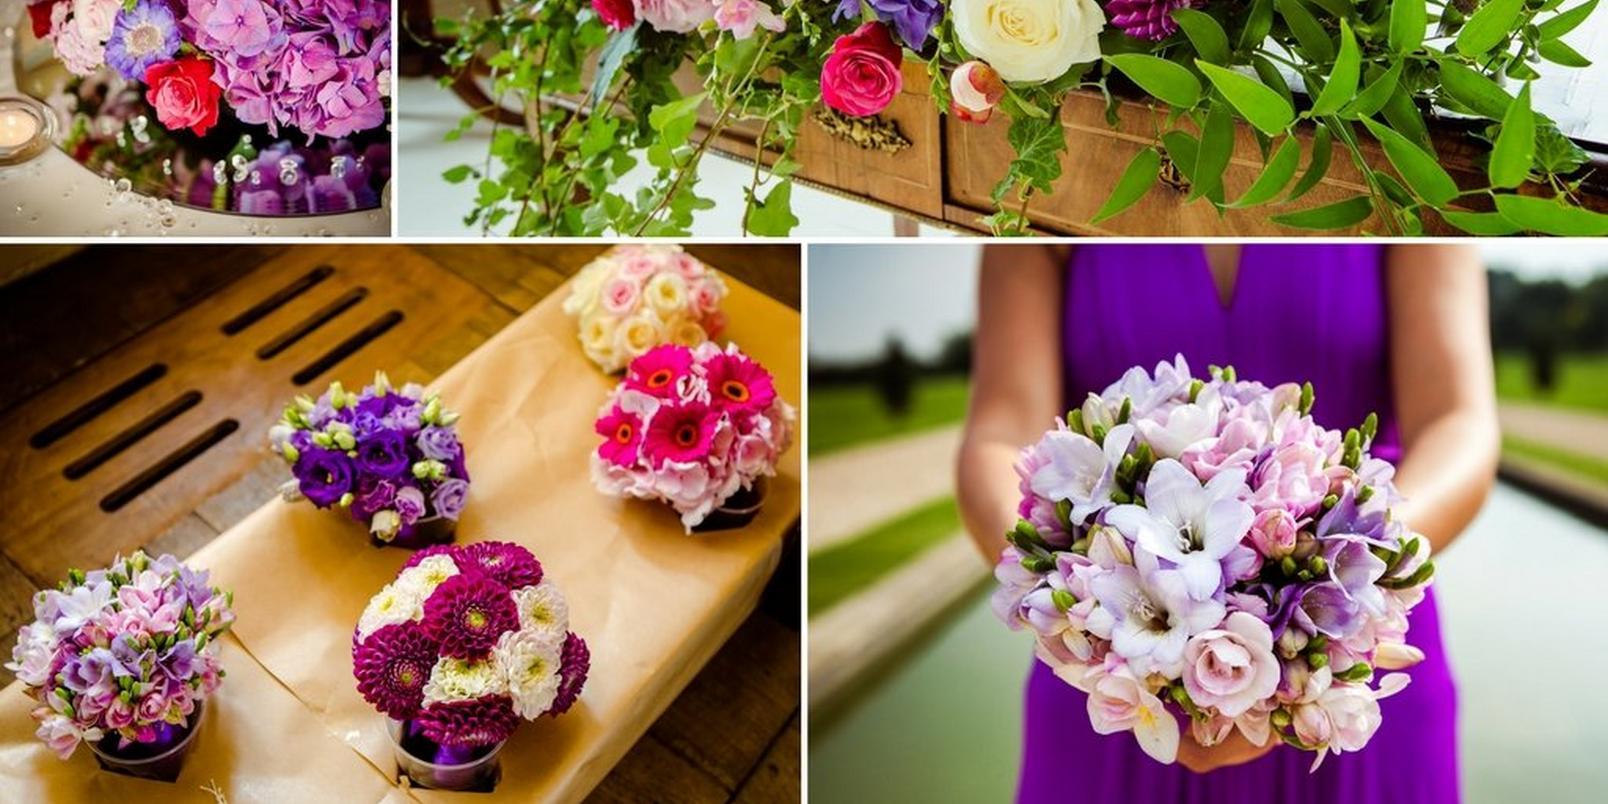 4_Untitled-design-summer-wedding-ideas